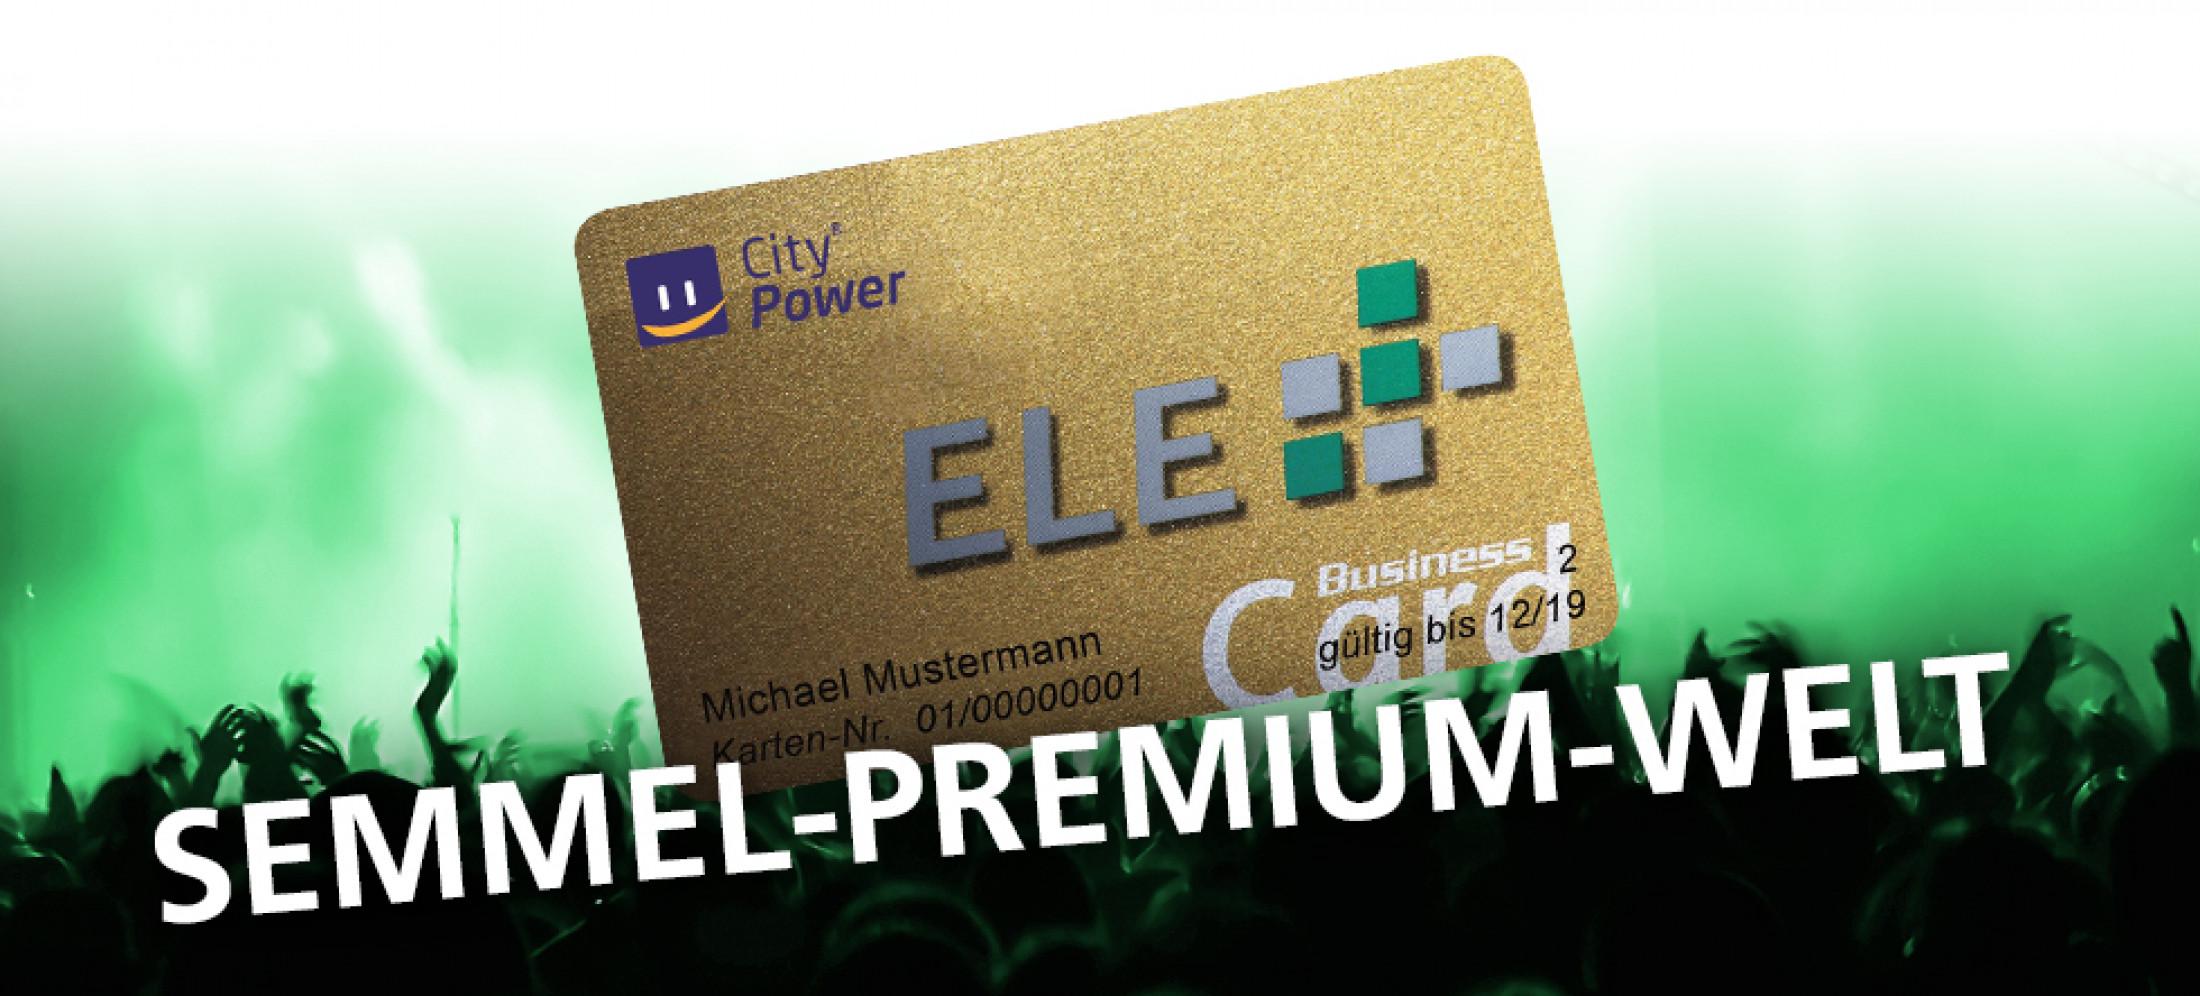 Semmel-Premium-Welt